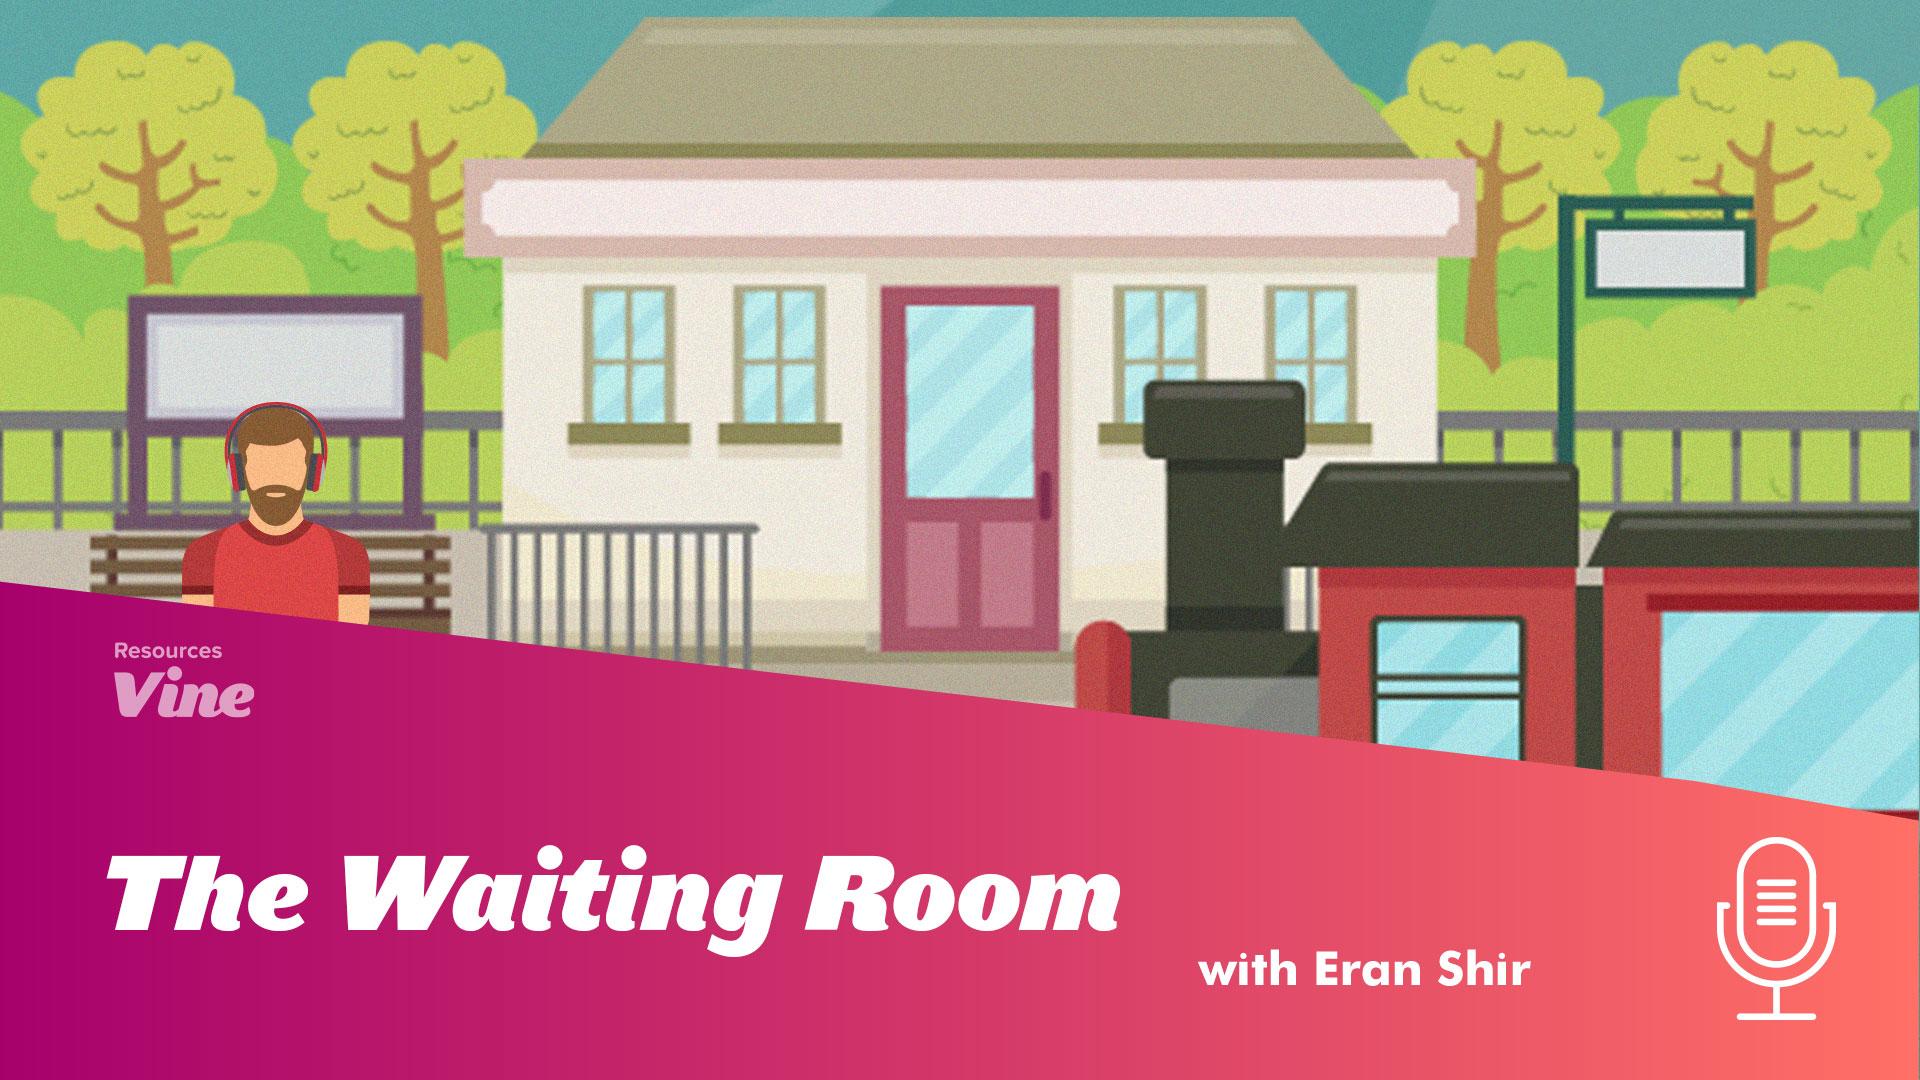 Thumbnail_The_Waiting_Room_ES